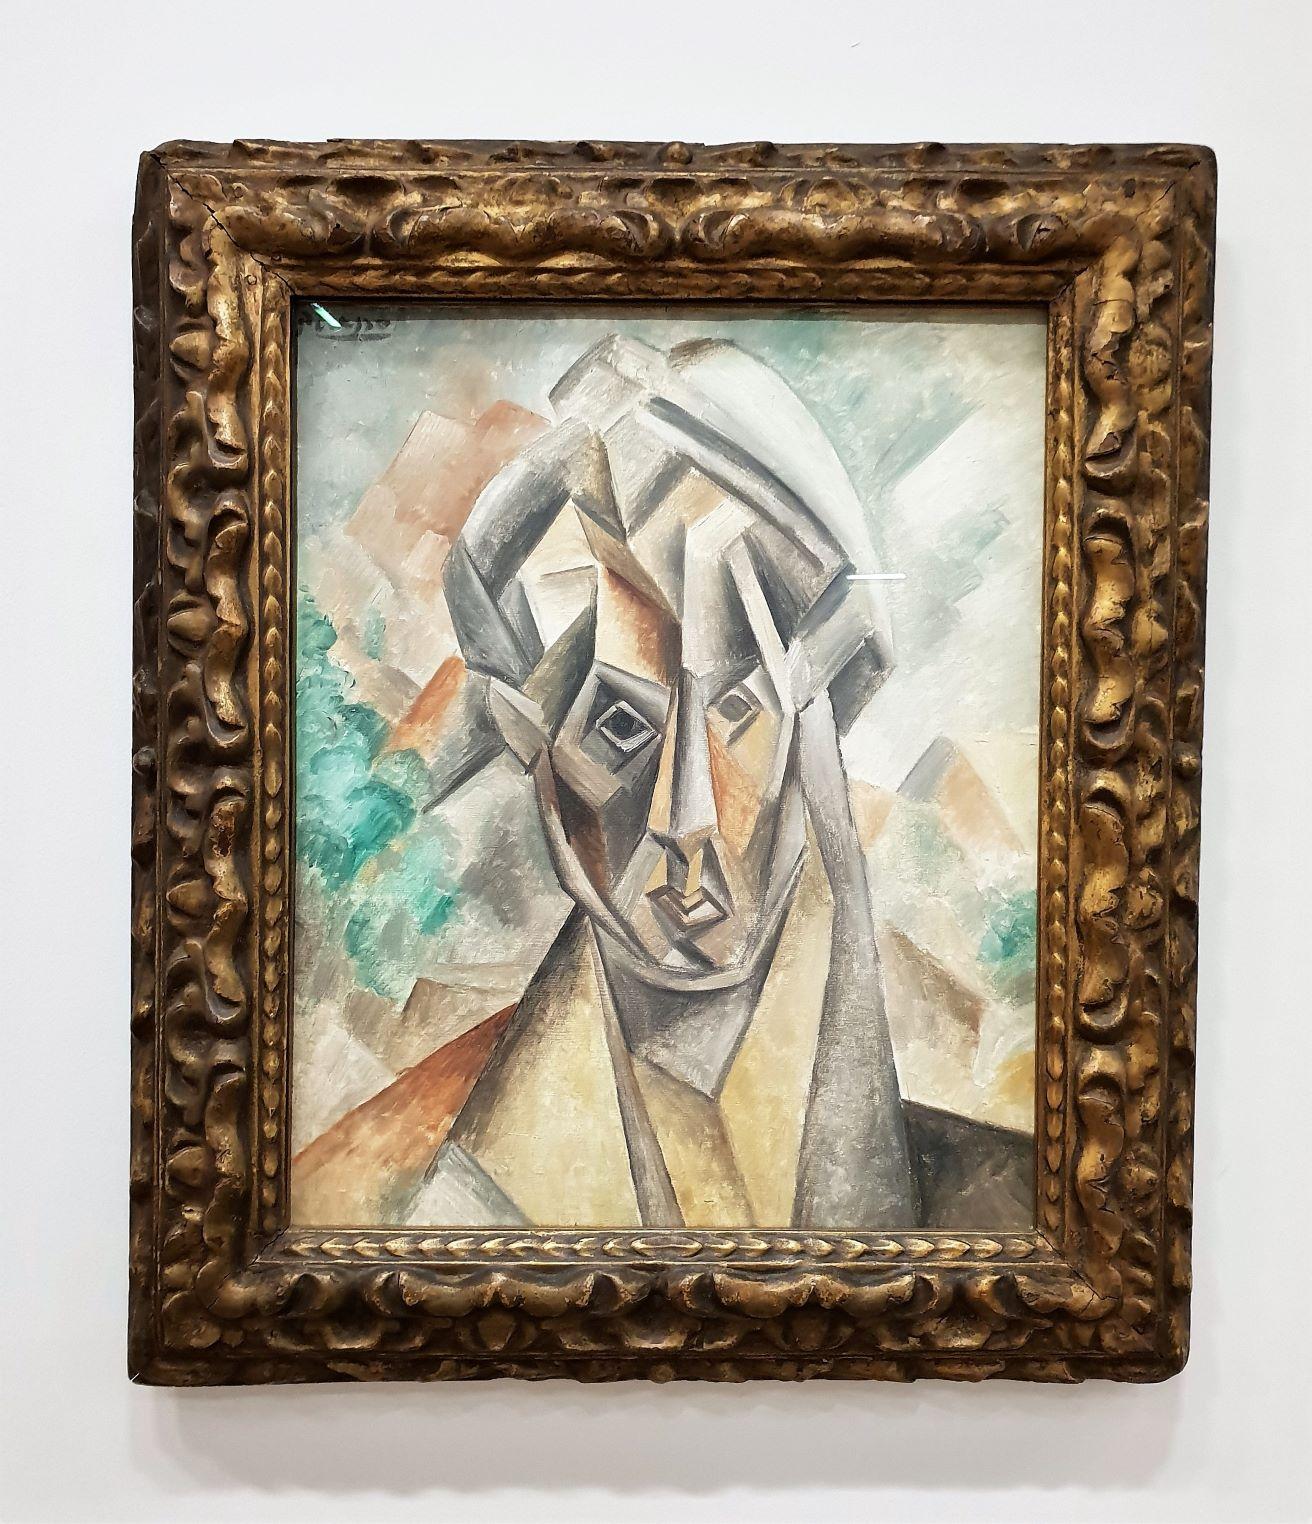 La quadratura del Cubismo, a Parigi. 300 opere al Pompidou. IMMAGINI